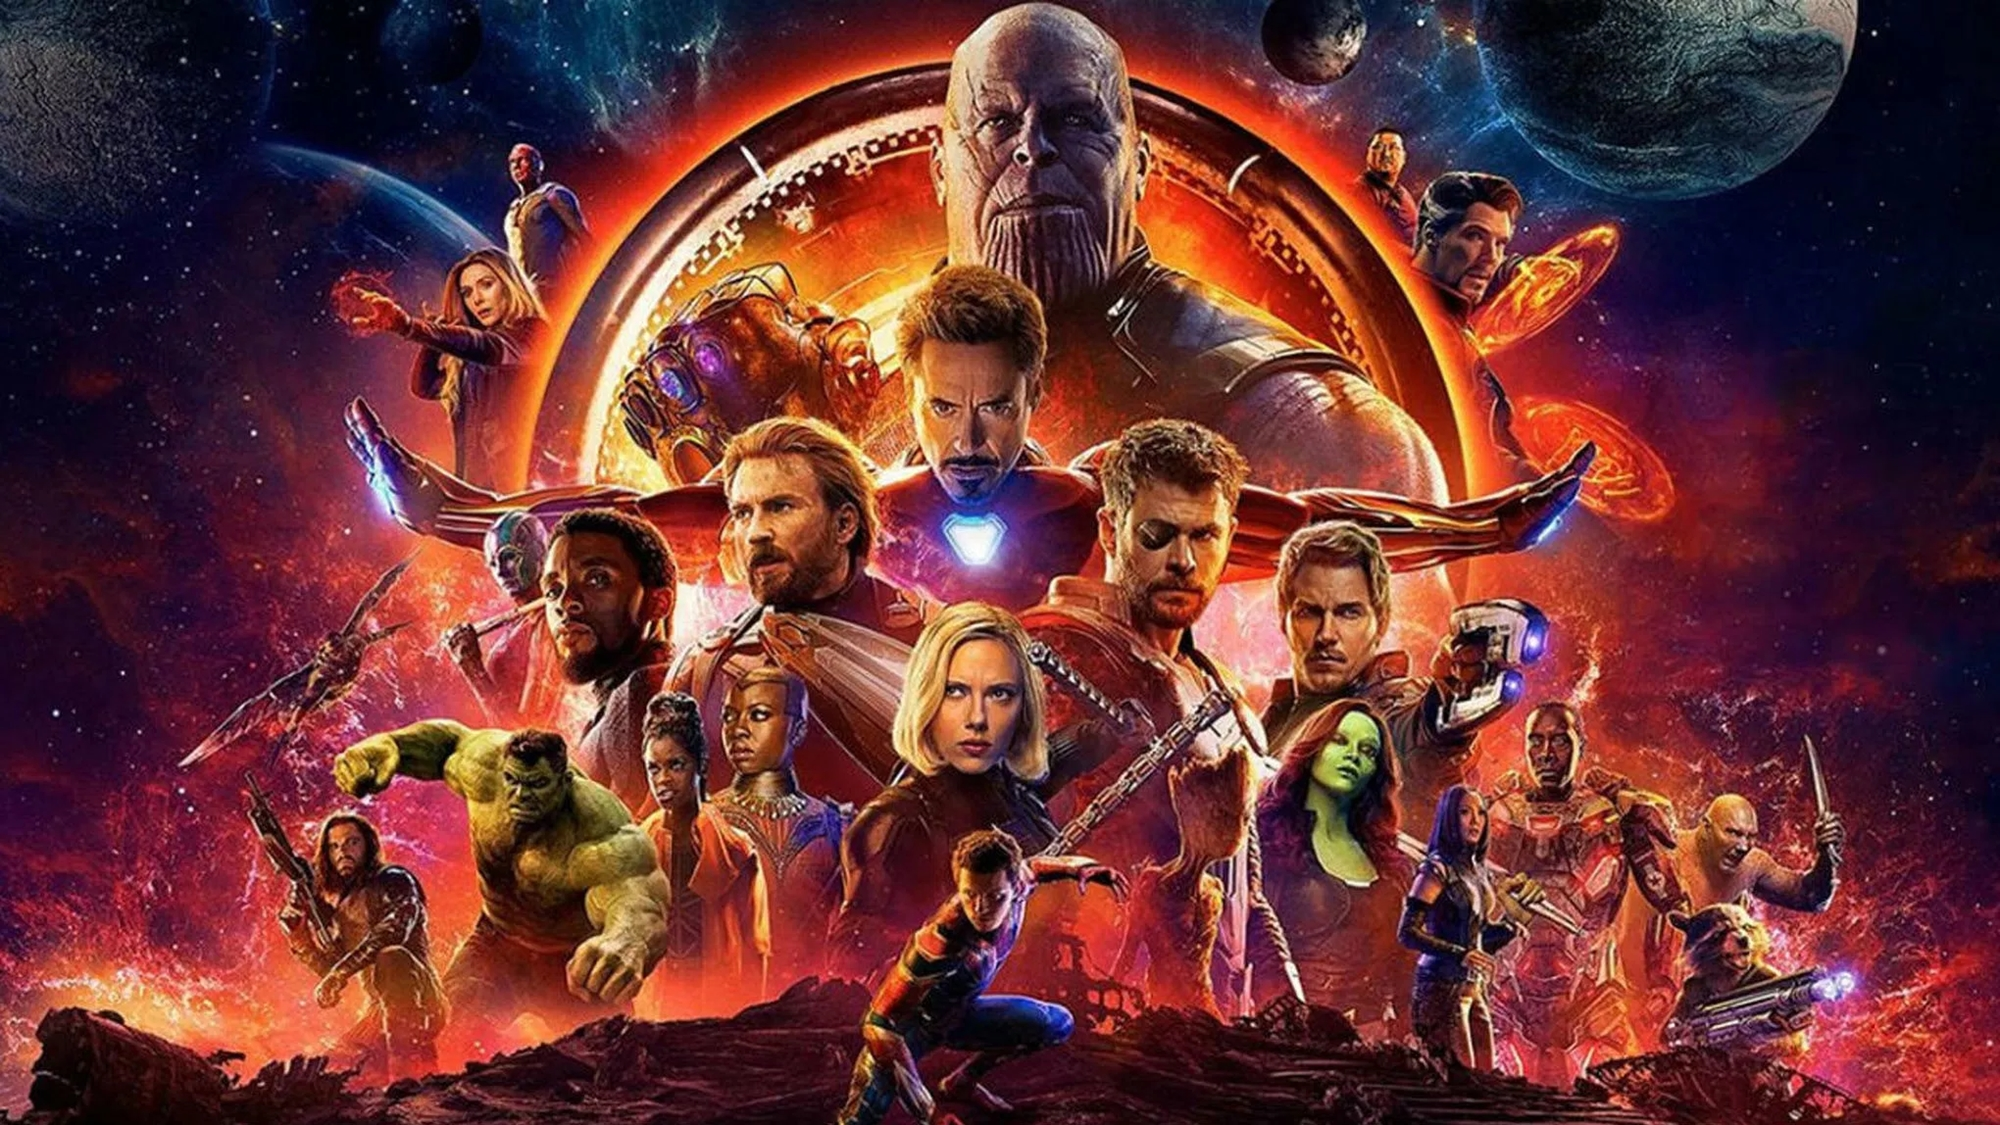 'Avengers: Infinity War' rompe récords globales de taquilla